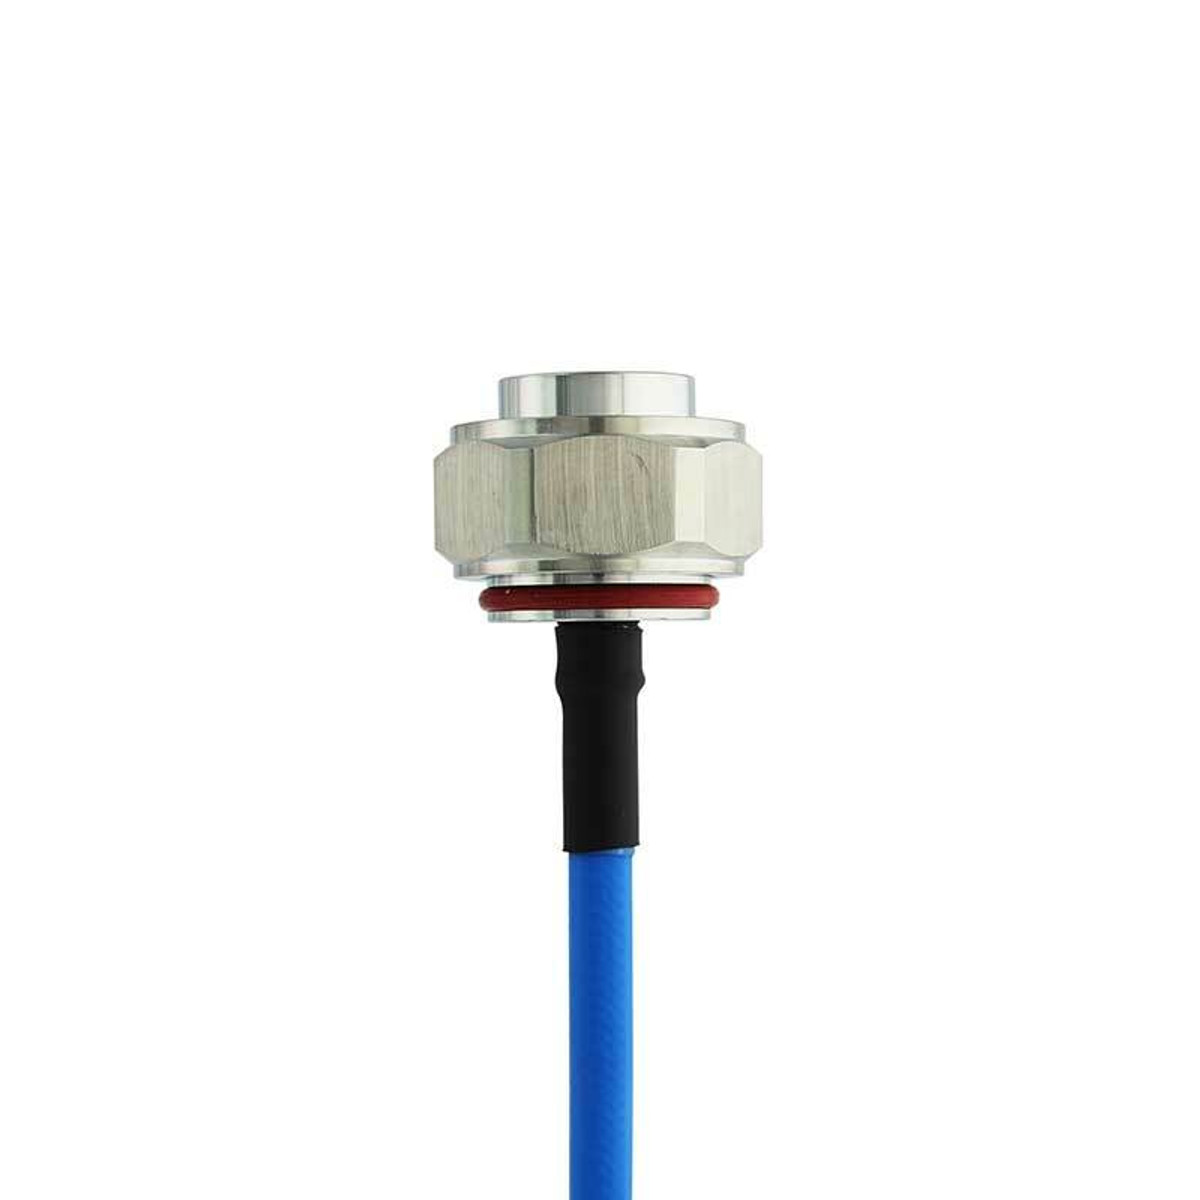 Techwave Techwave Low PIM 3 Ft Jumper Cable - Mini DIN Male to DIN Male